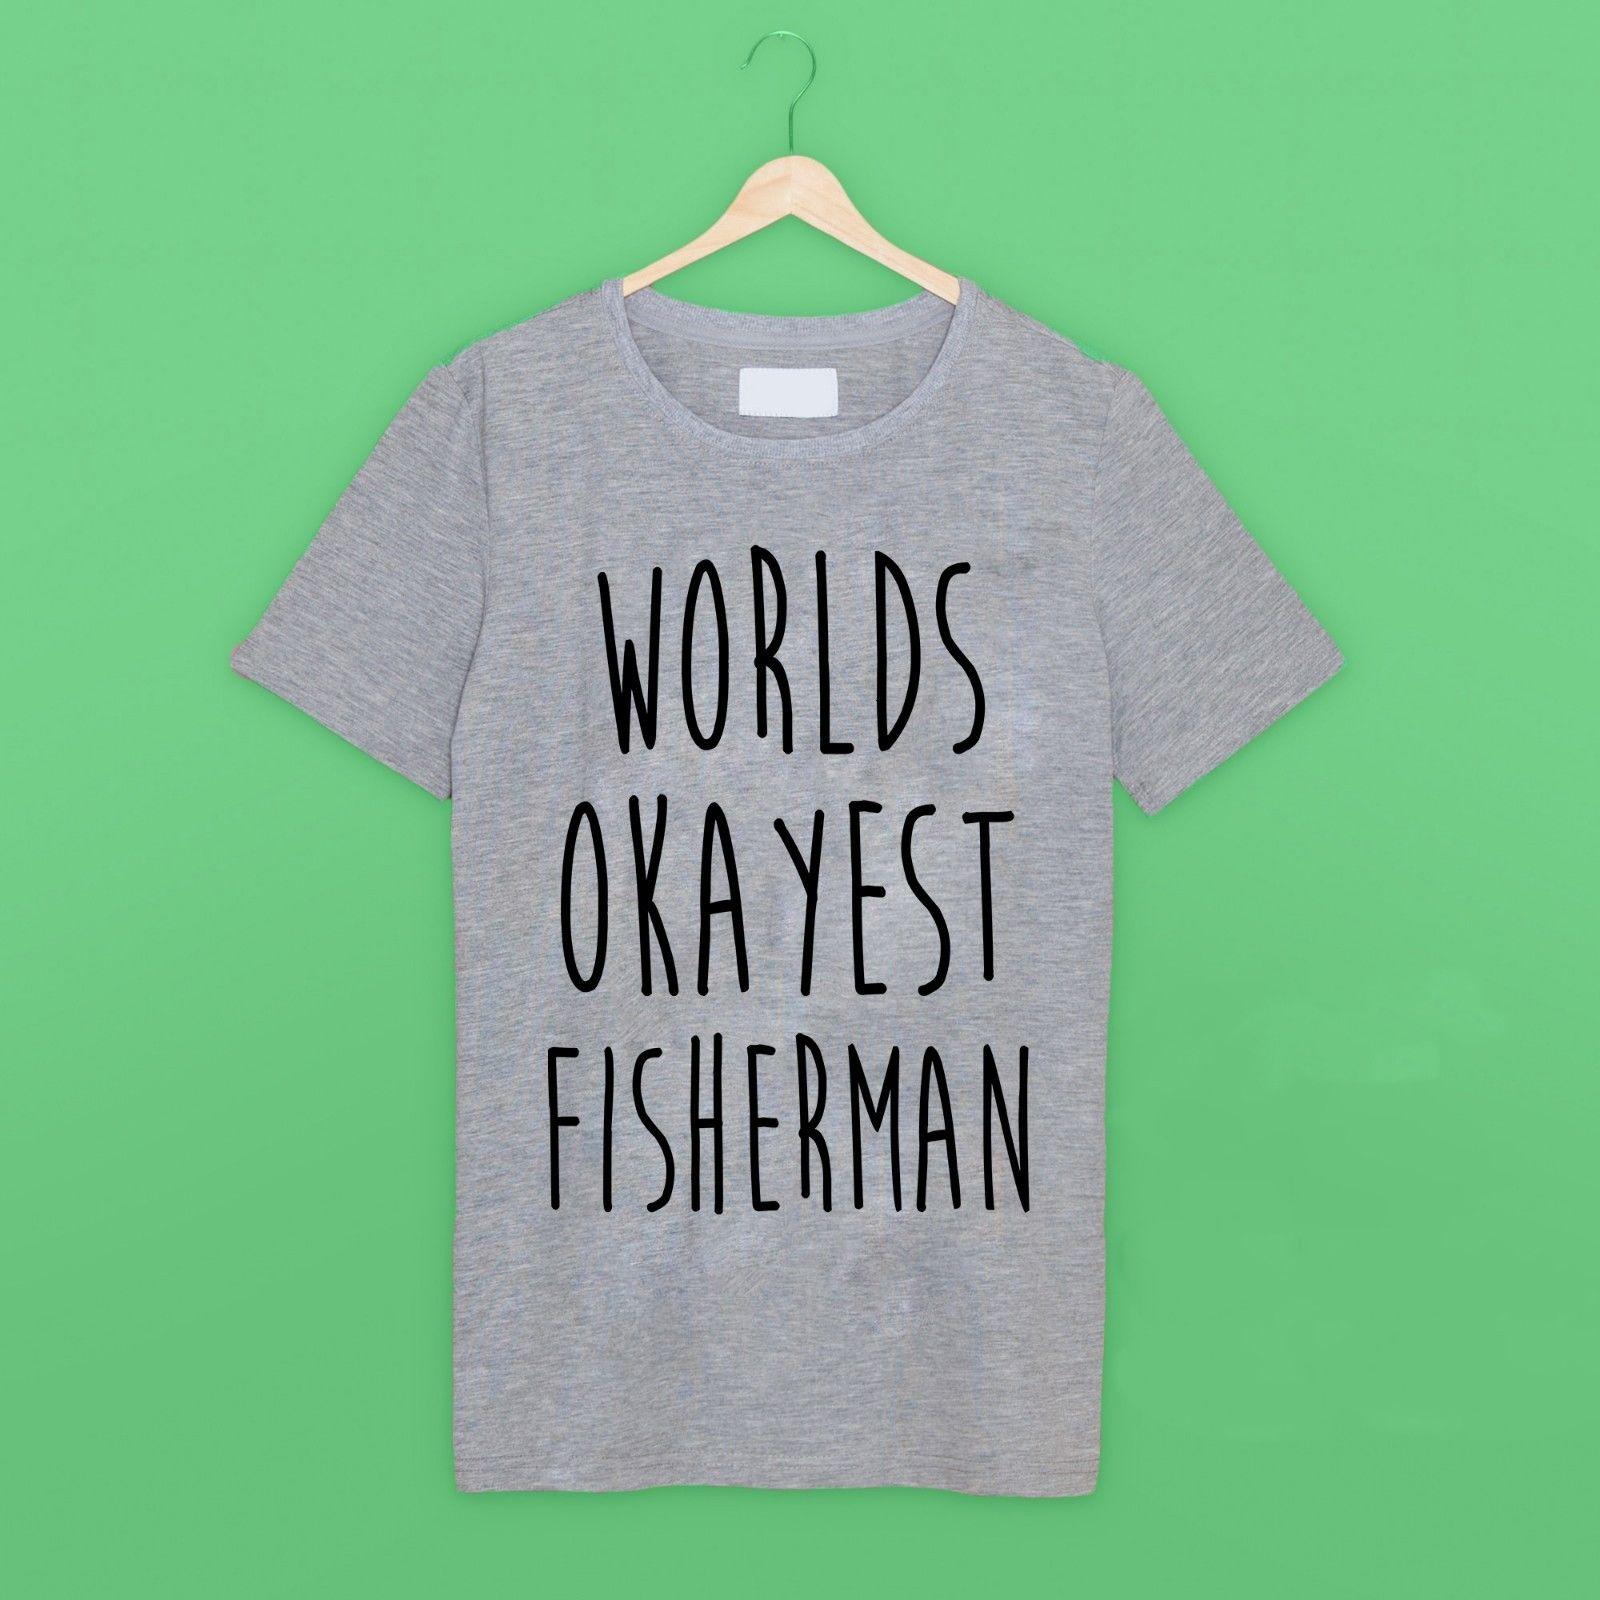 T shirt design job - Worlds Okayest Fisherman Funny Fishinger Job Work T Shirt In Grey Fashion Arrival Simple High Quality